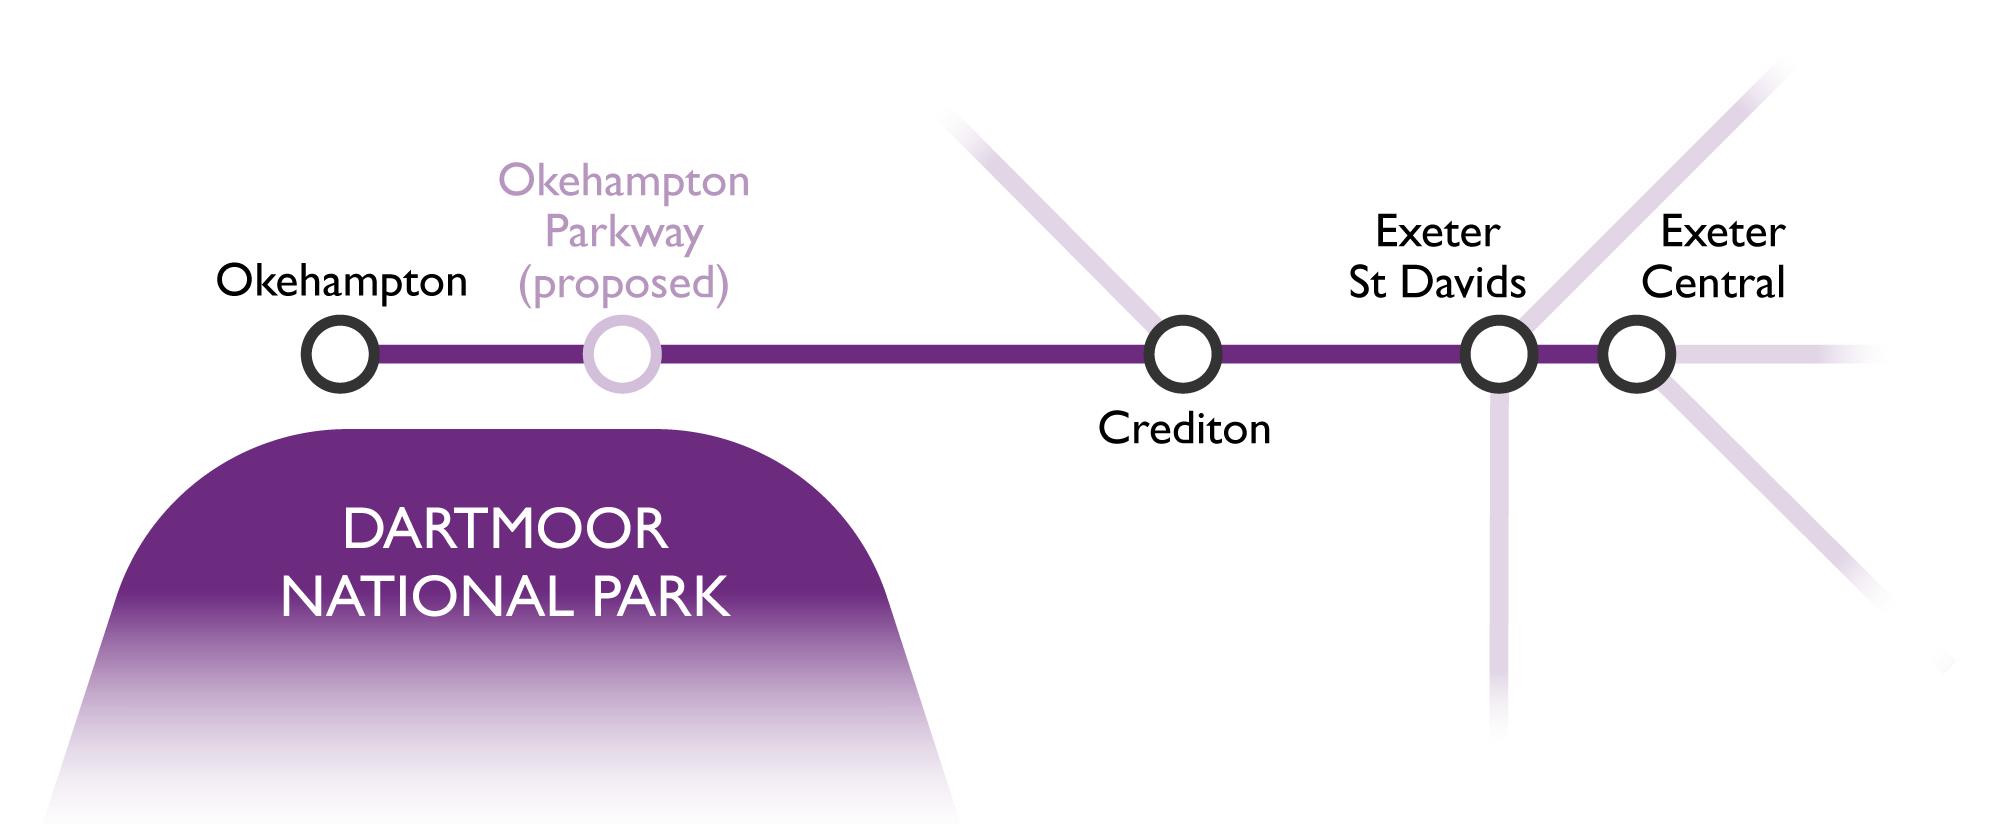 Dartmoor Line basic map of Okehampton to Exeter route